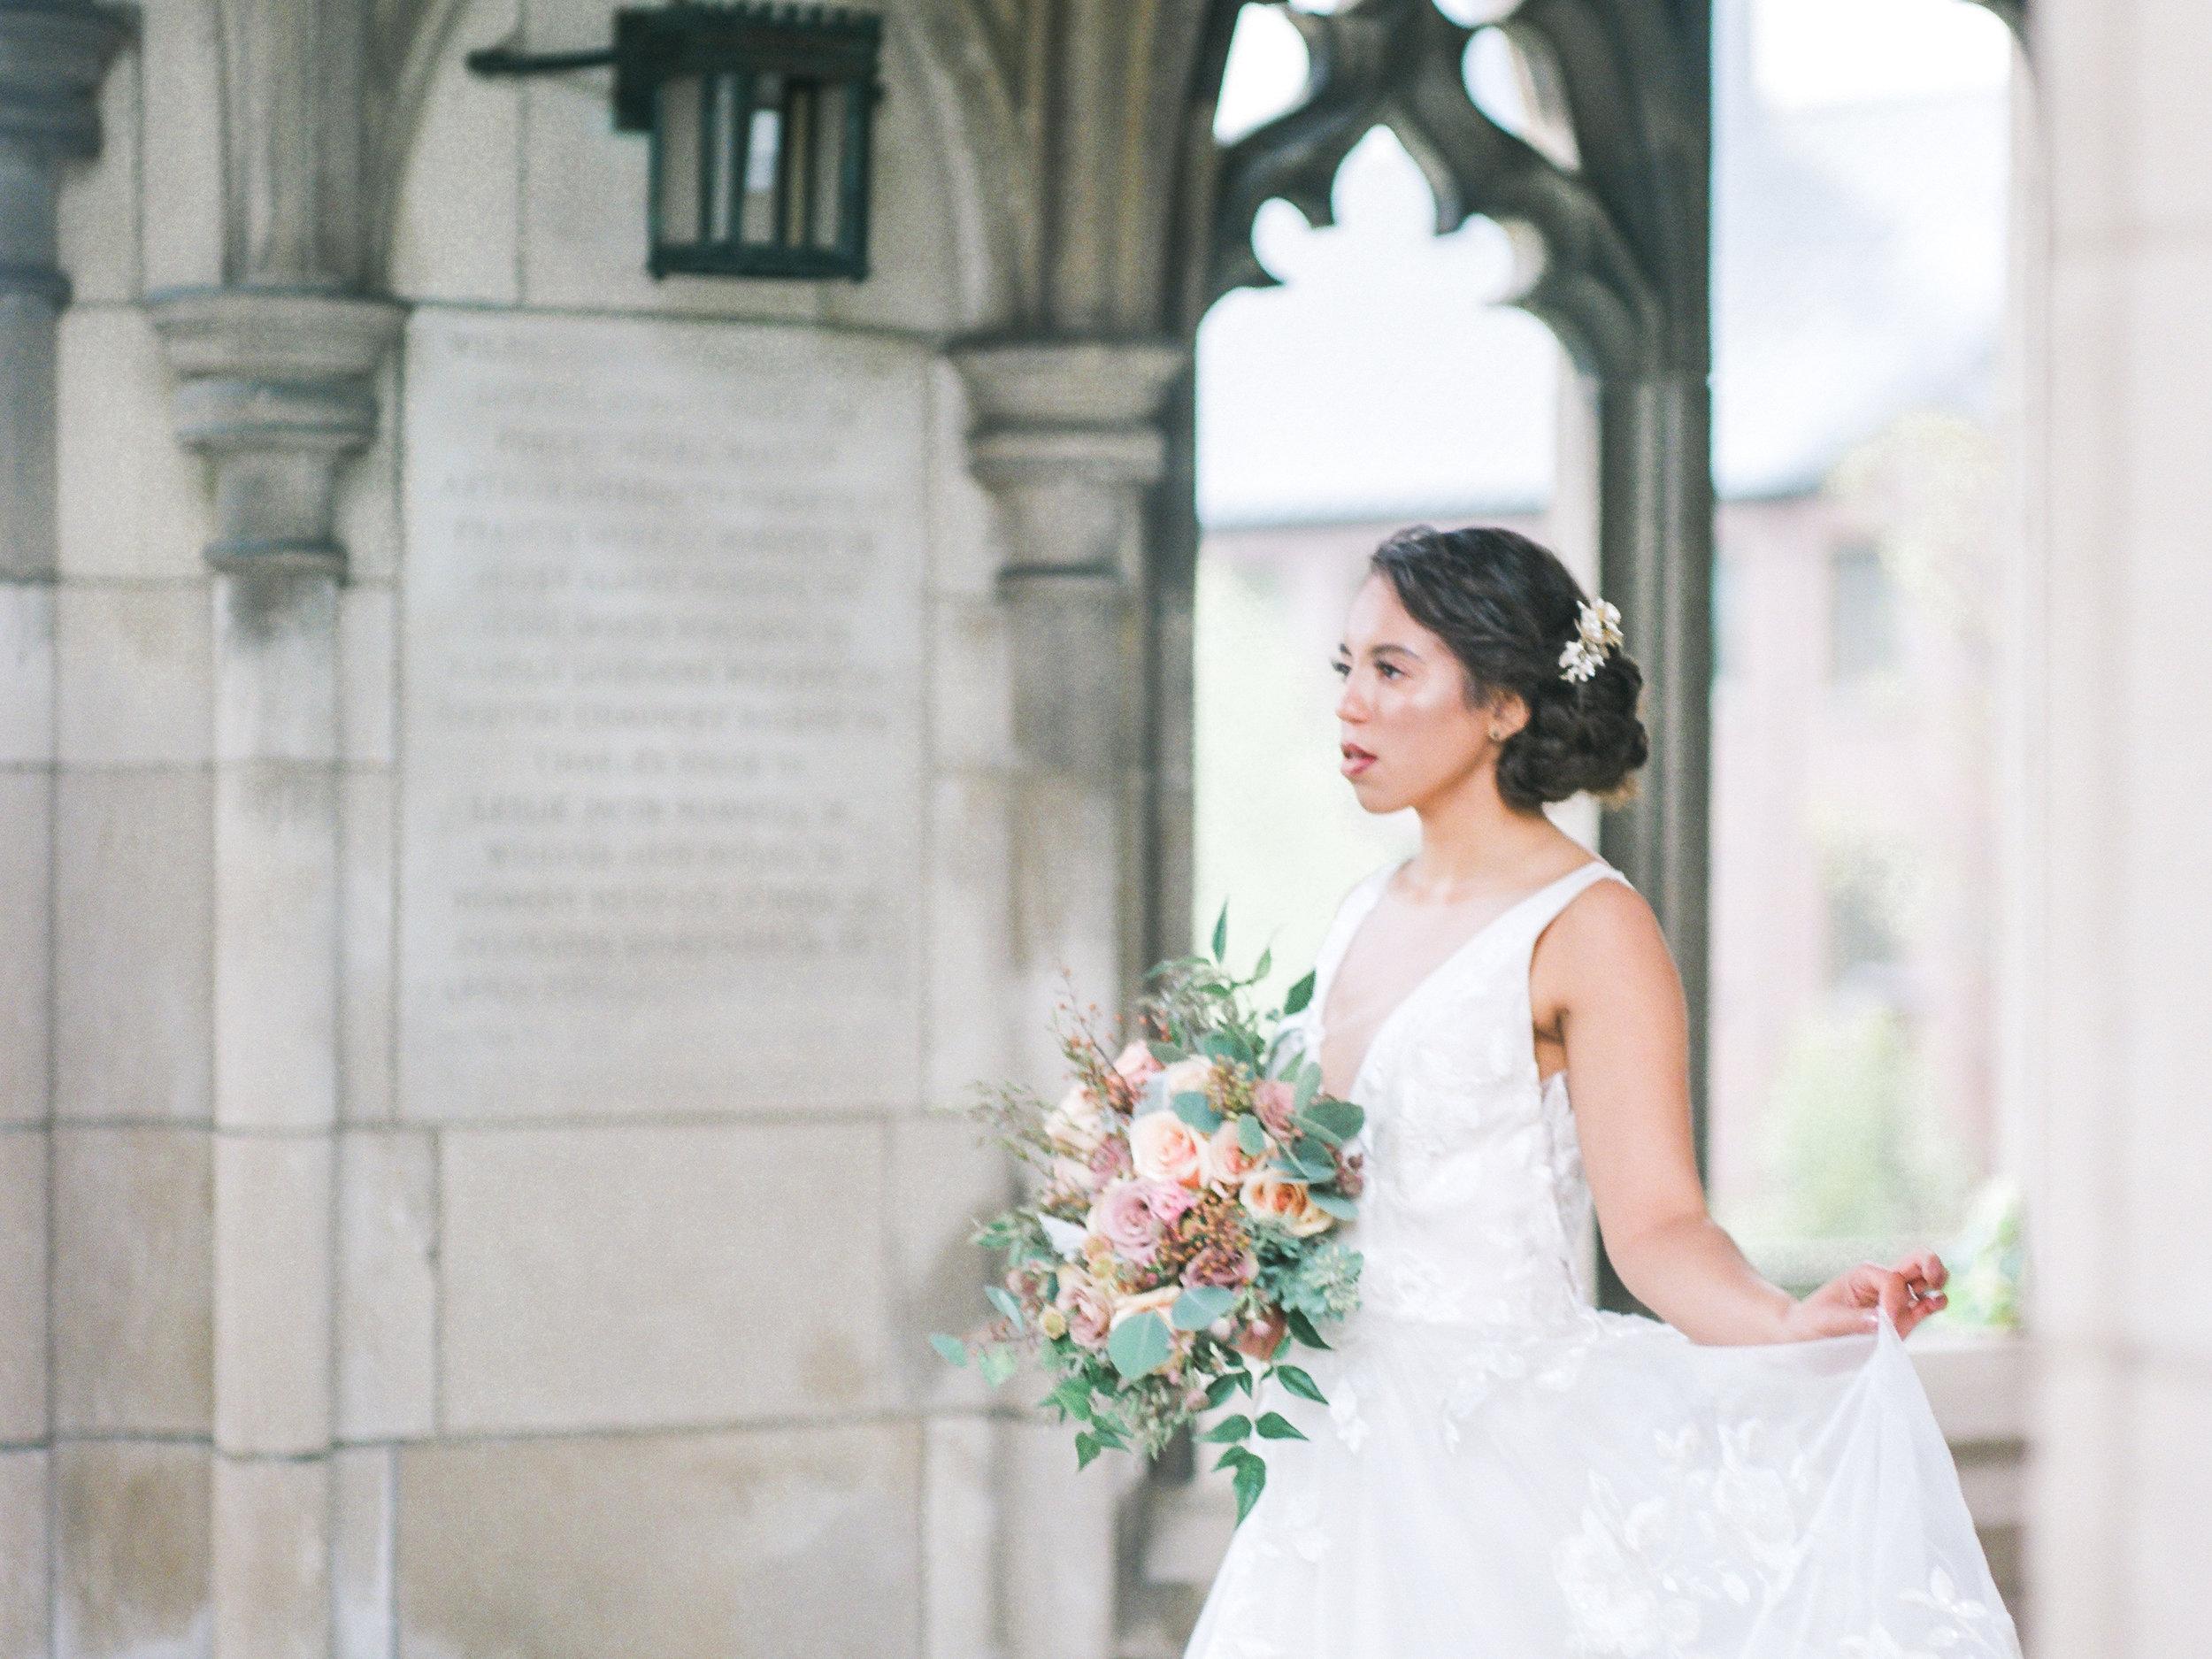 Ithaca New York-Brides Story-Manda Weaver-Wedding-59.jpg